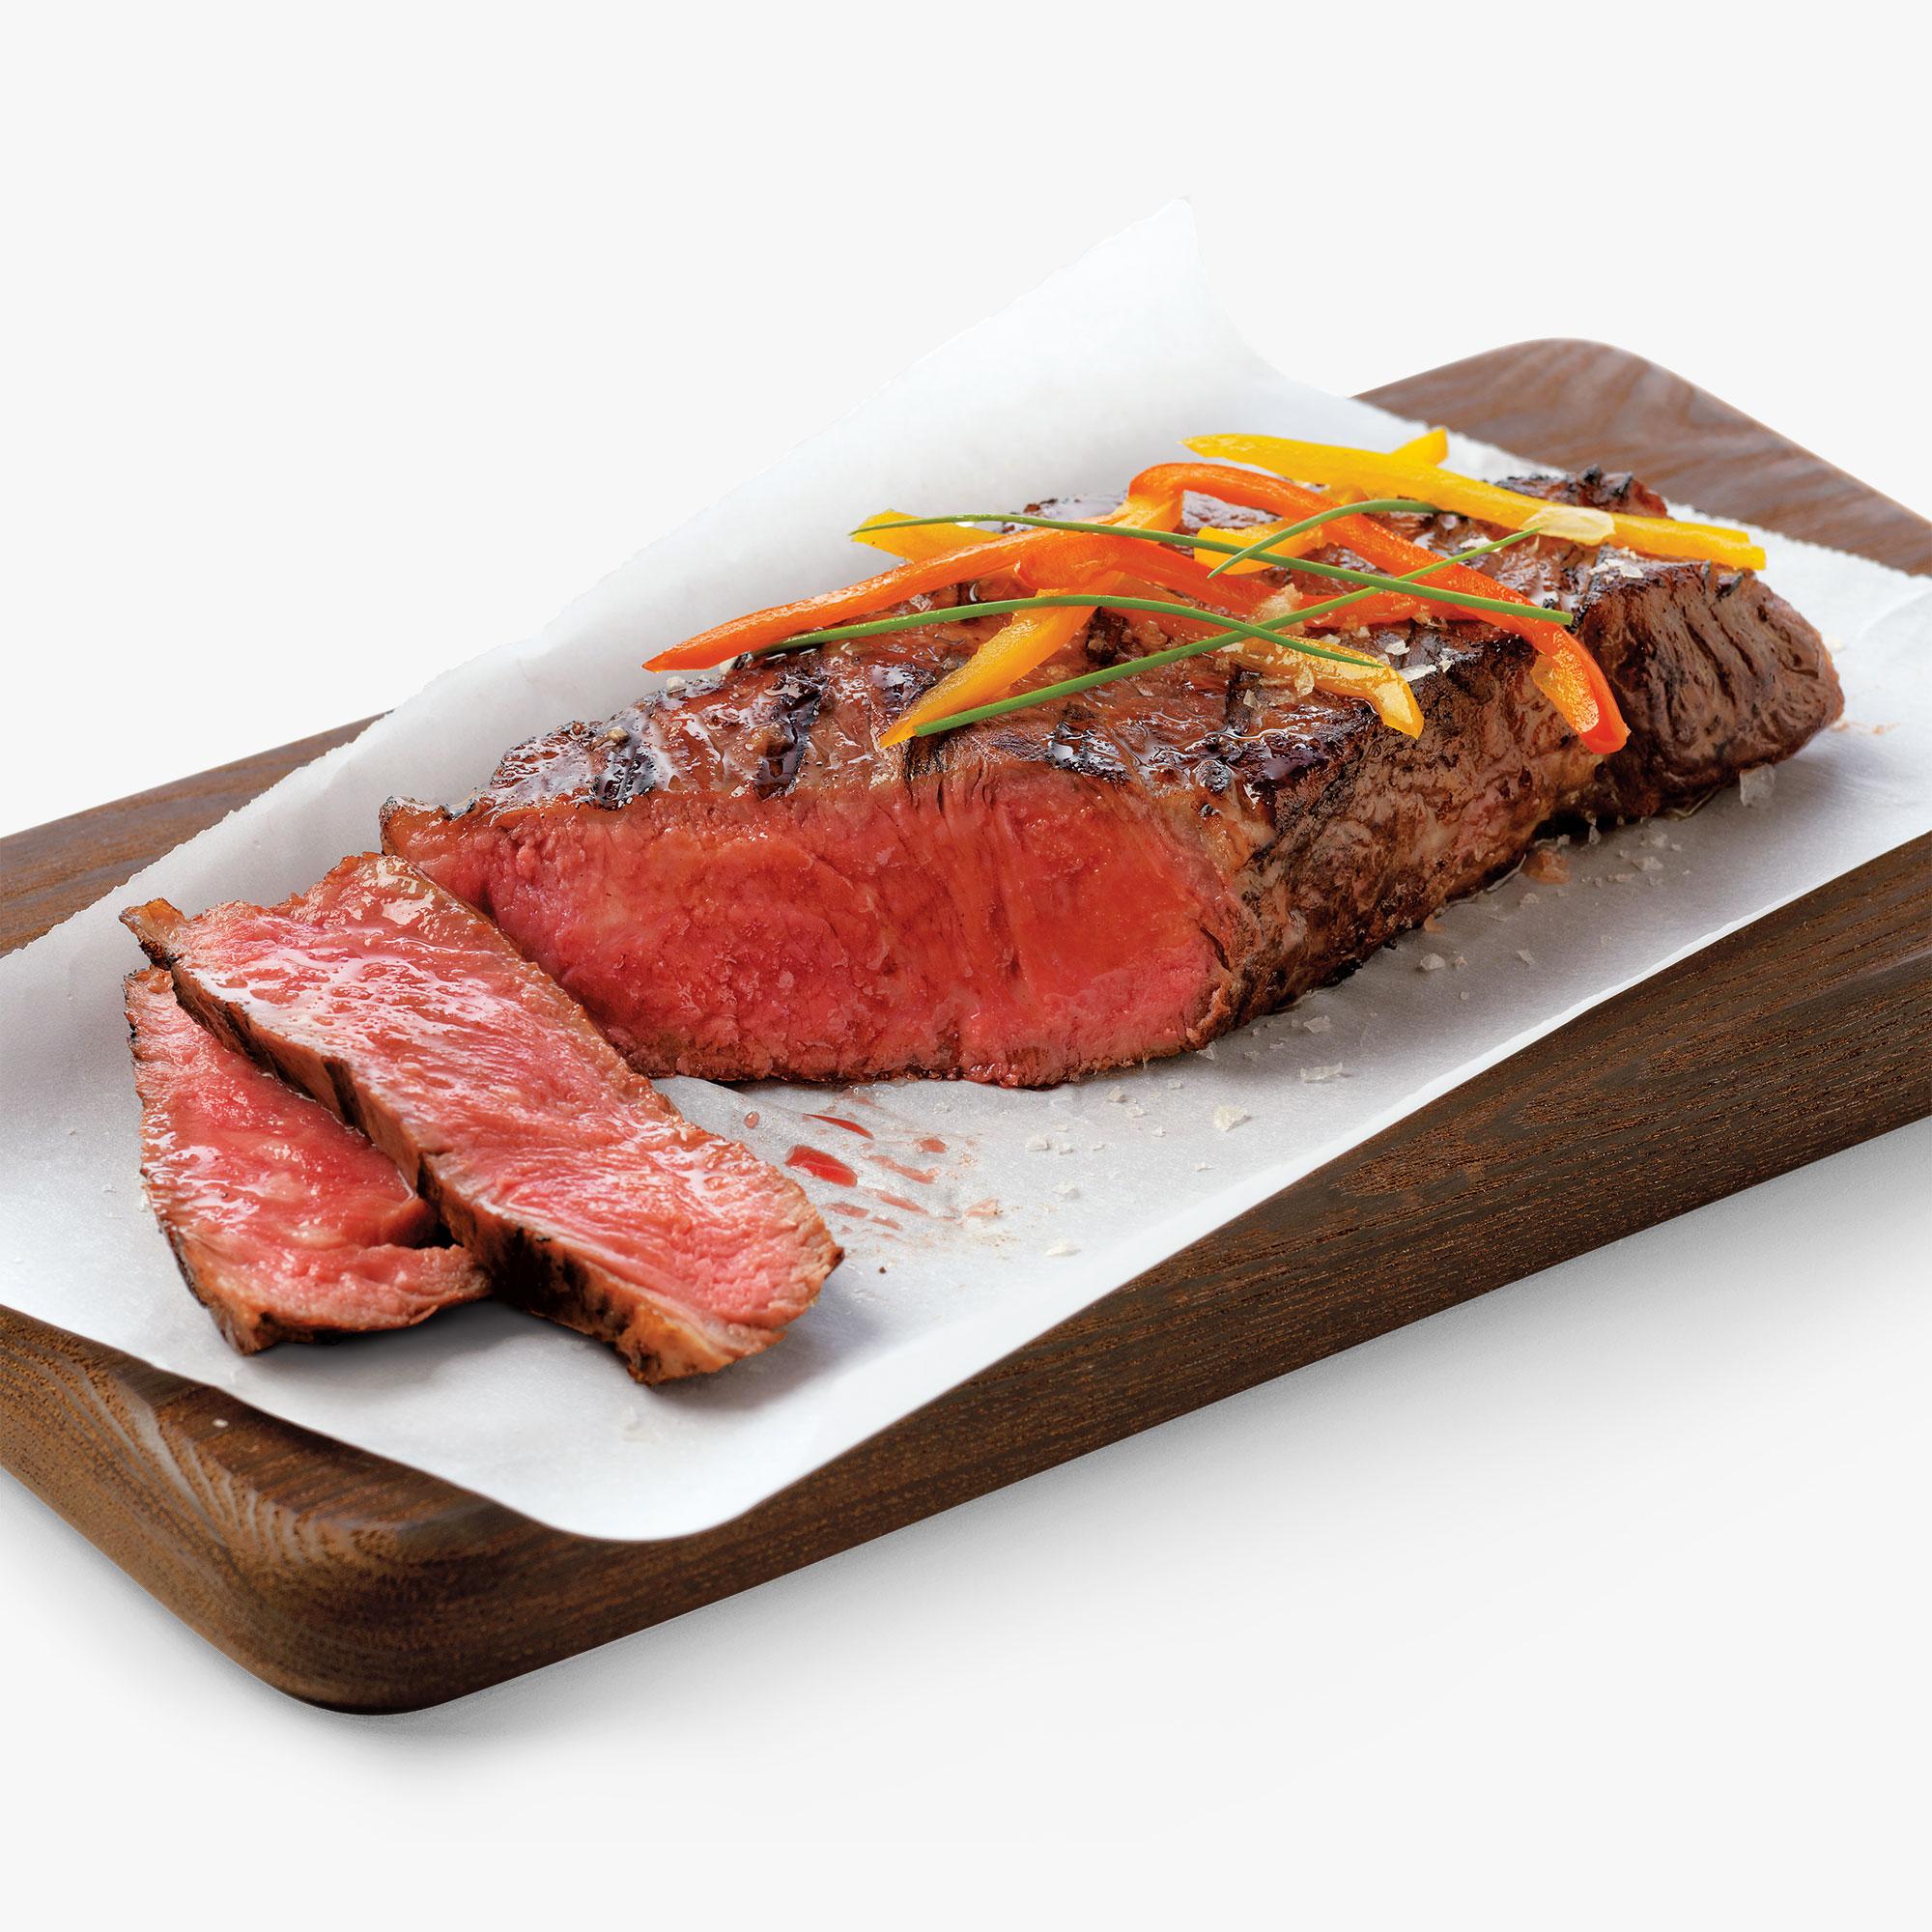 8(10 oz) New York Strip Steaks